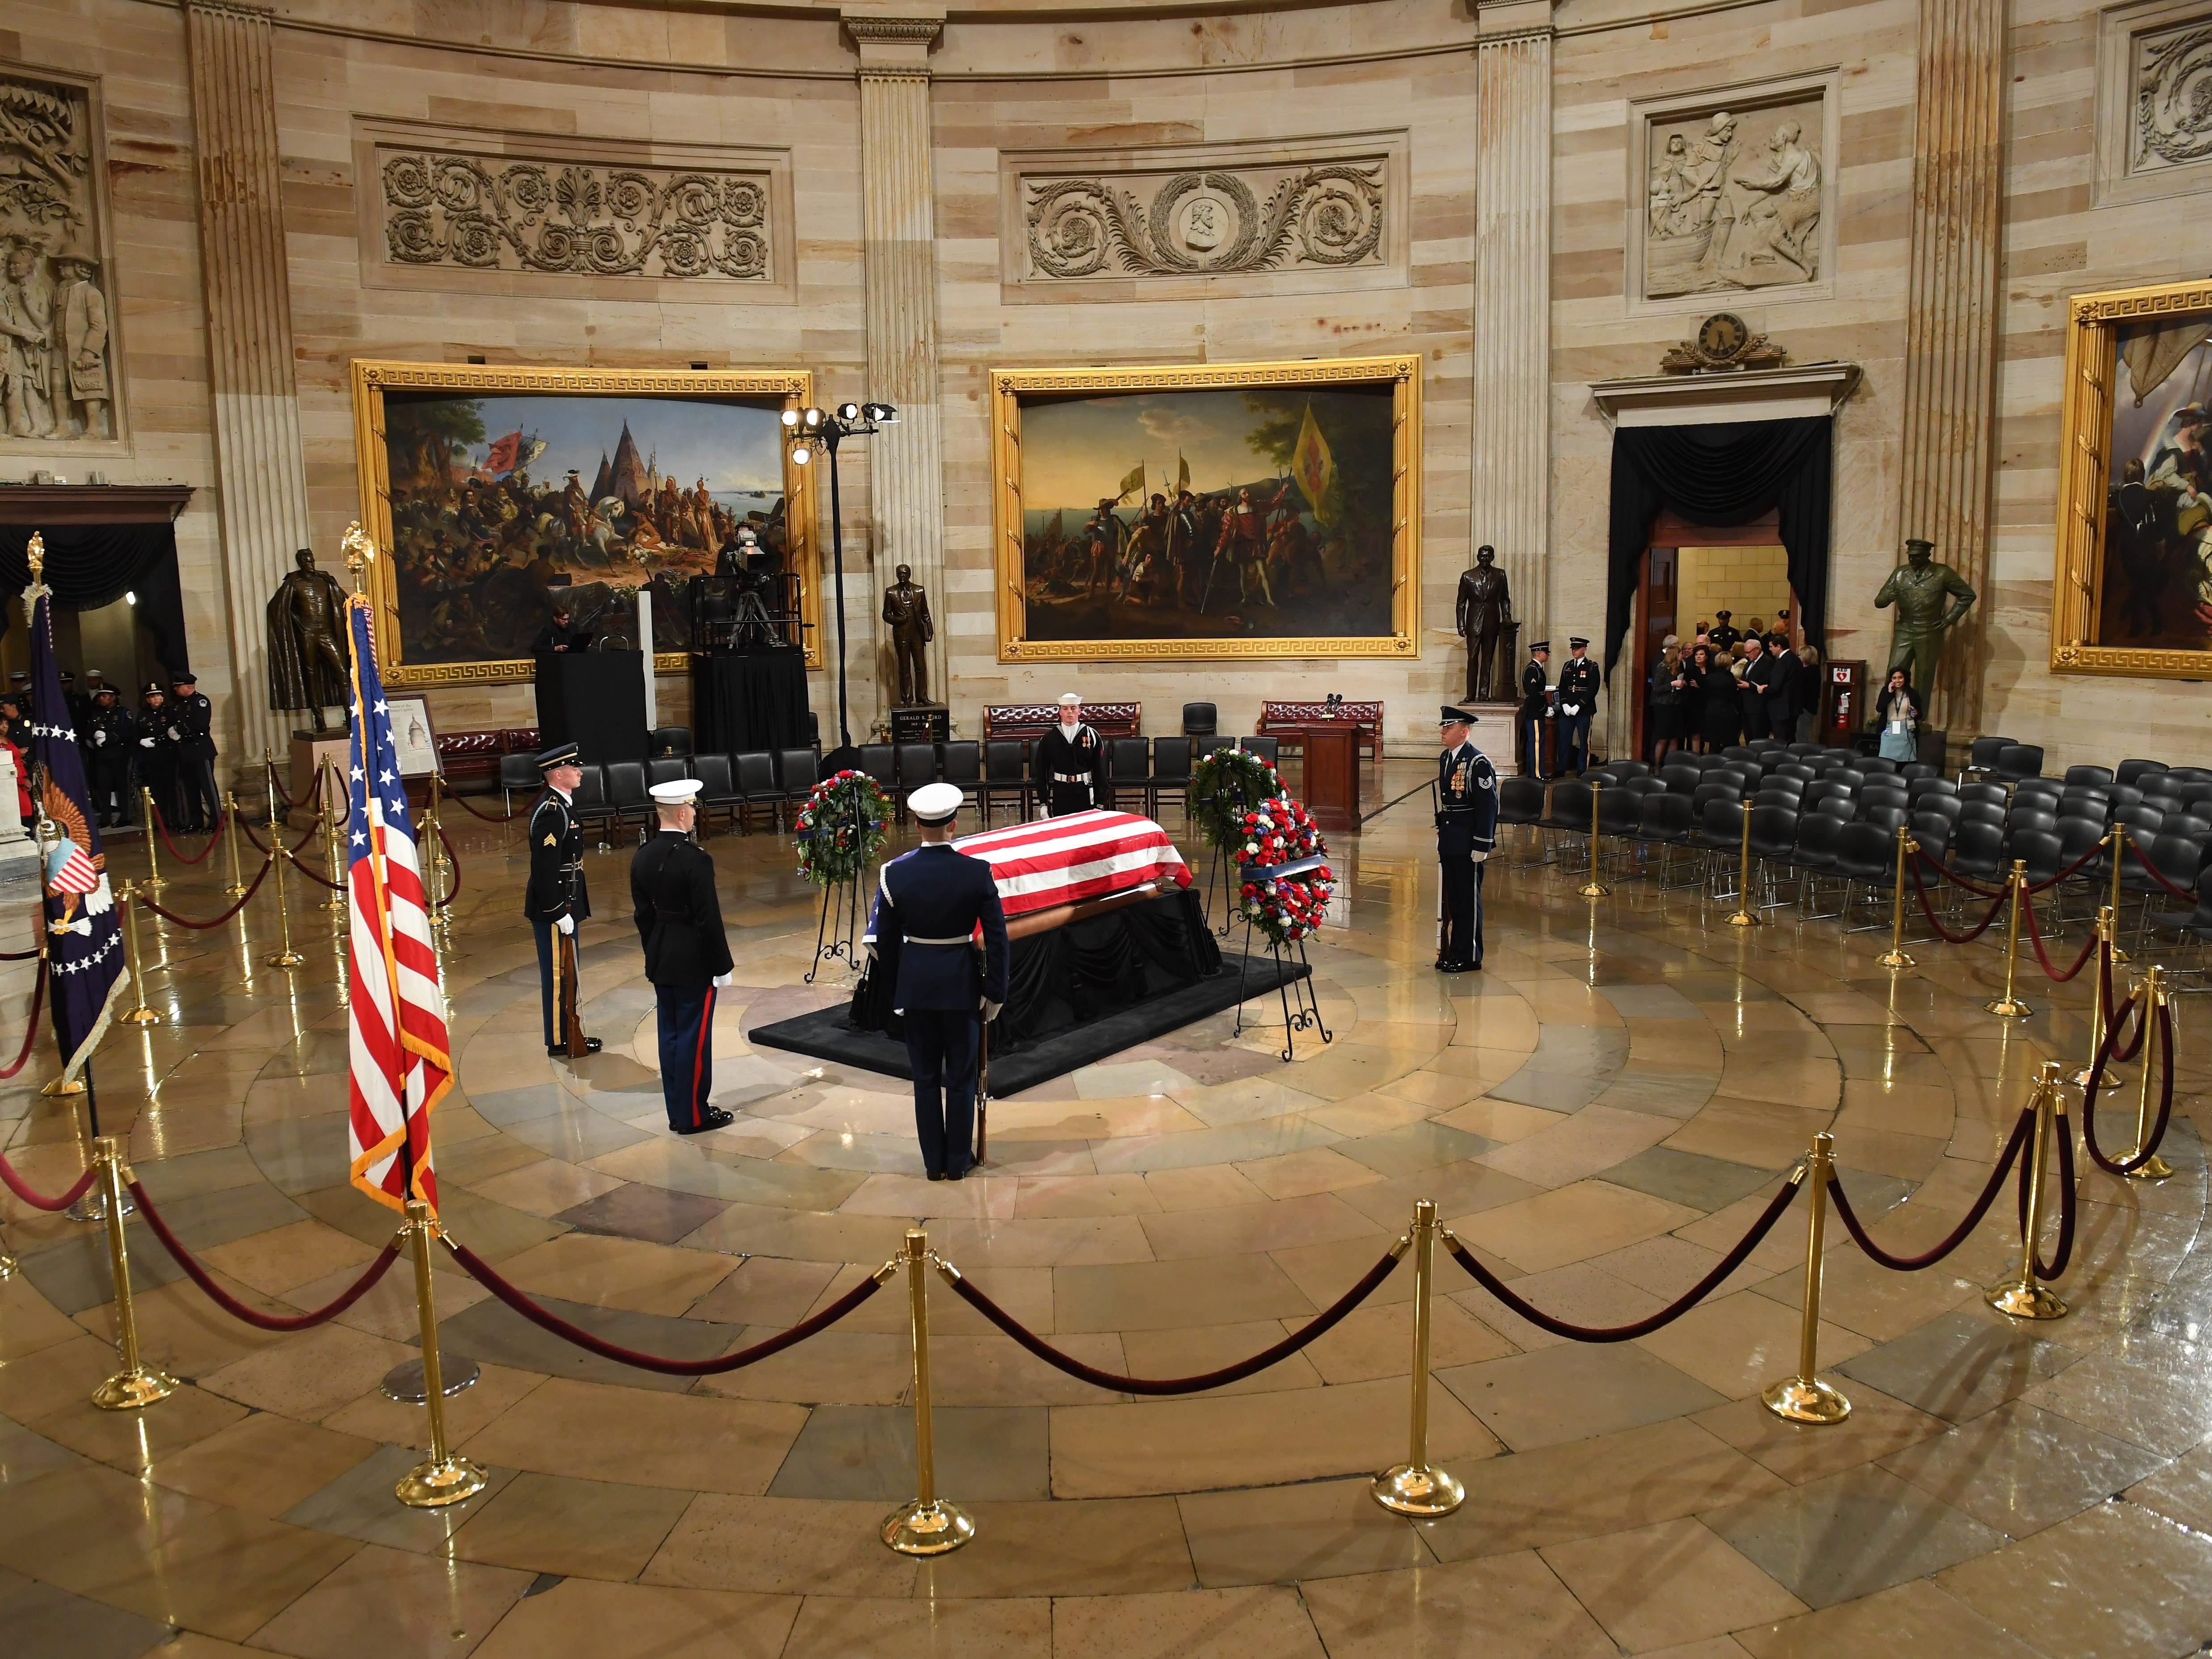 President George H.W. Bush lies in state at the U.S. Capitol Rotunda